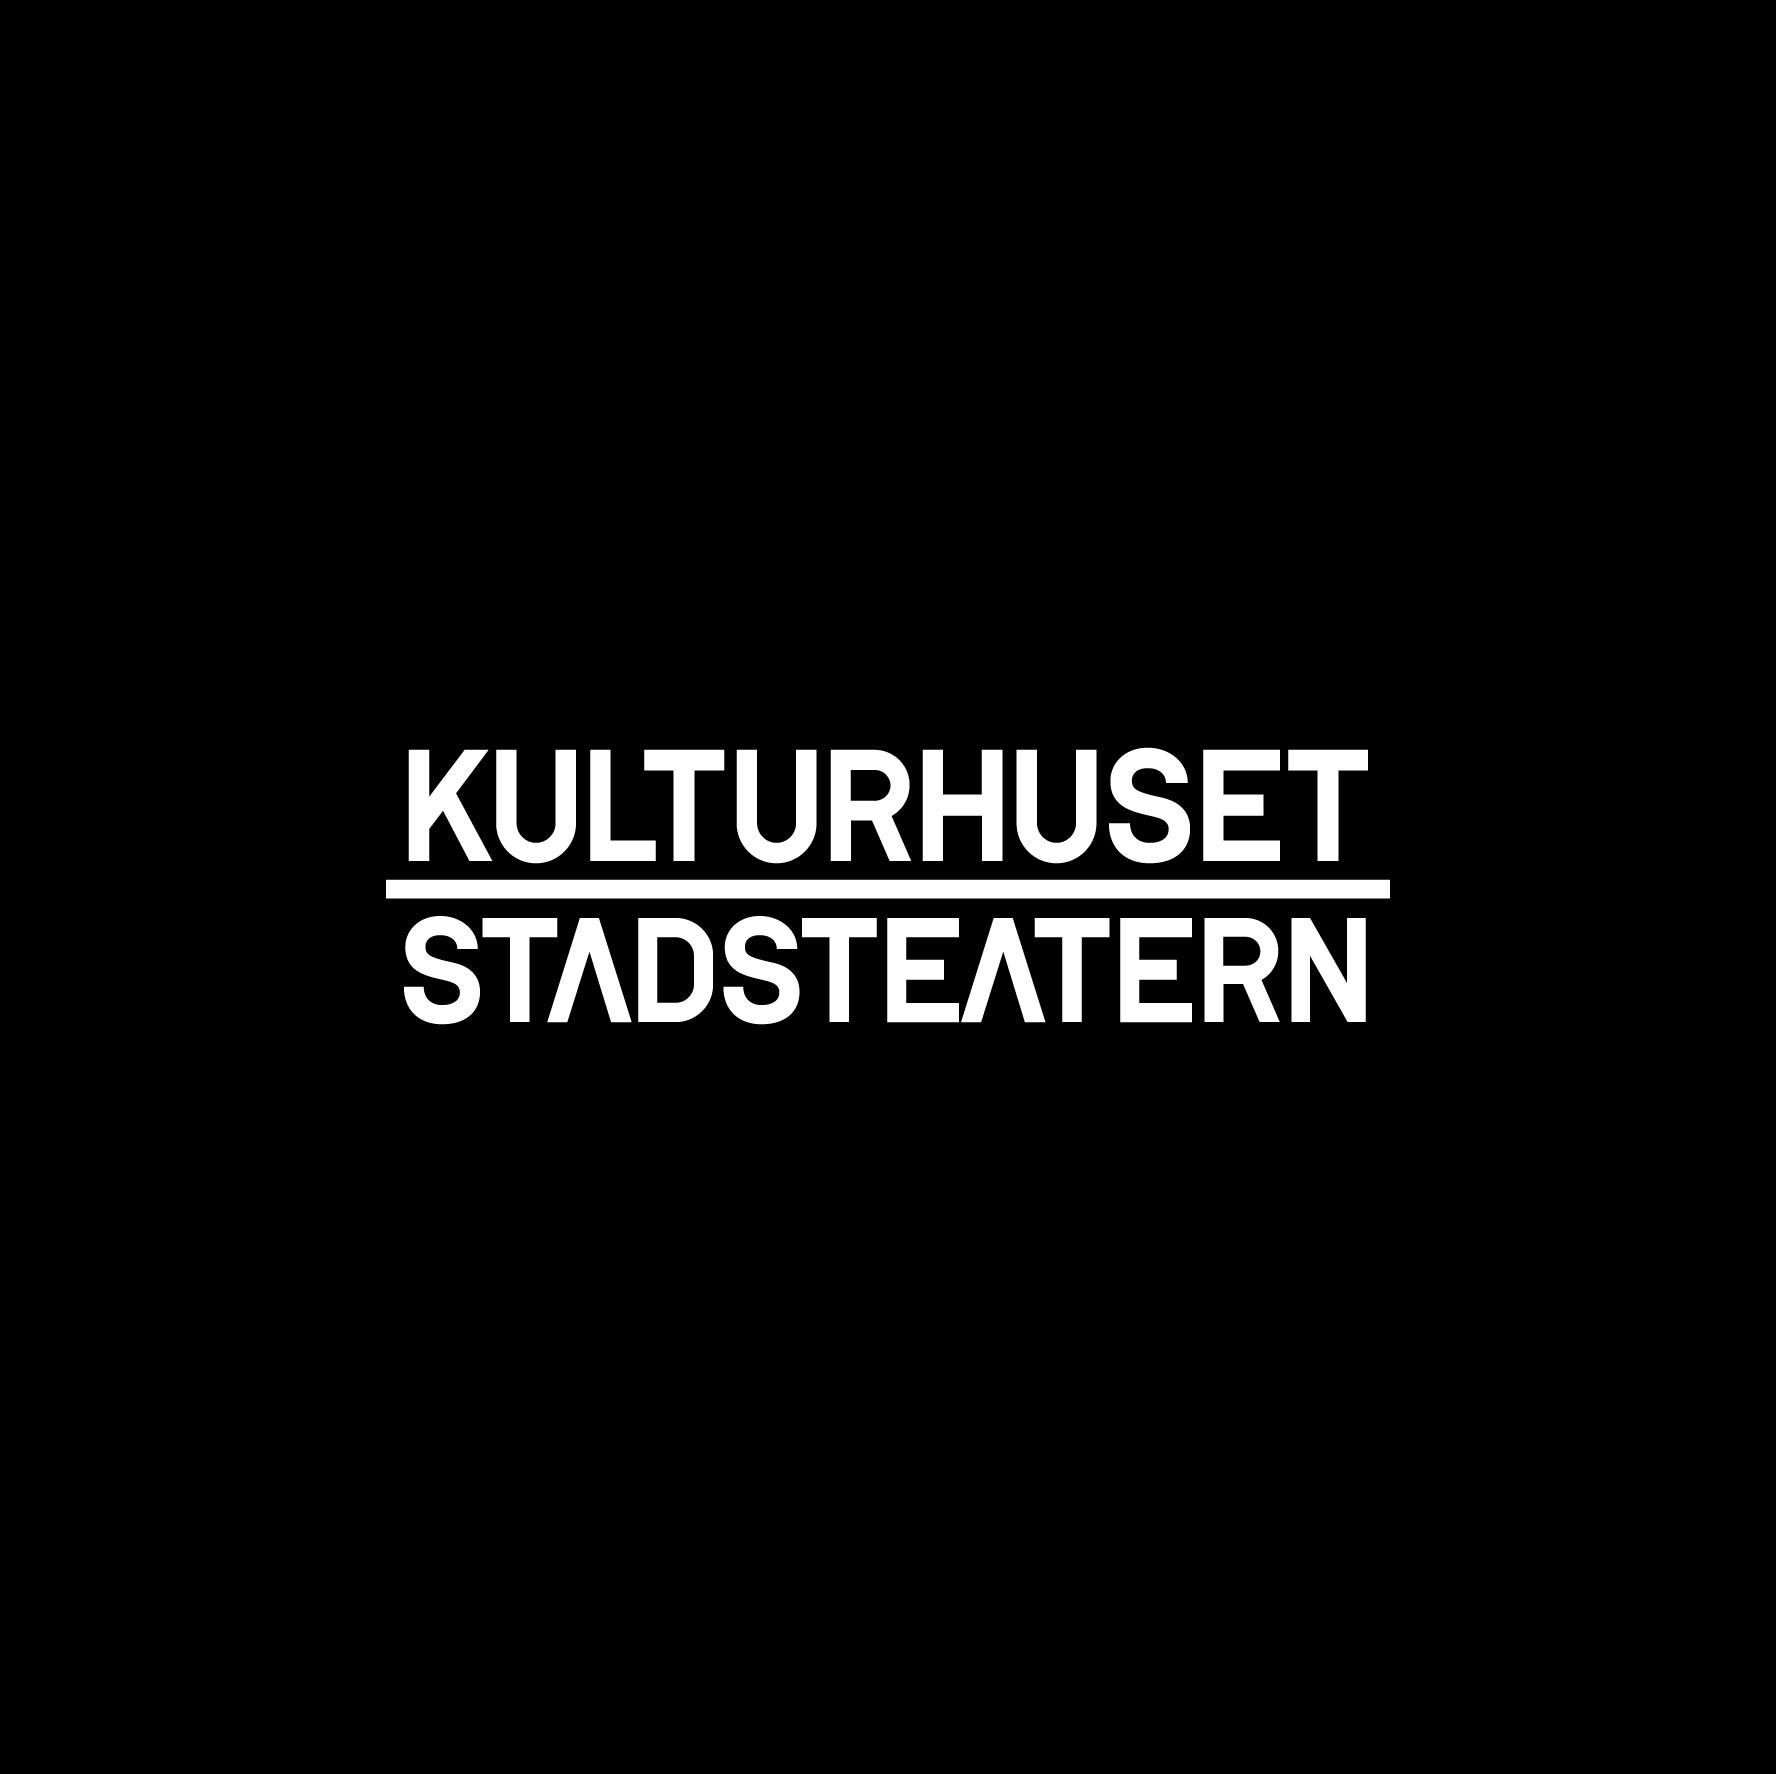 logo for Kulturhuset Stadsteatern